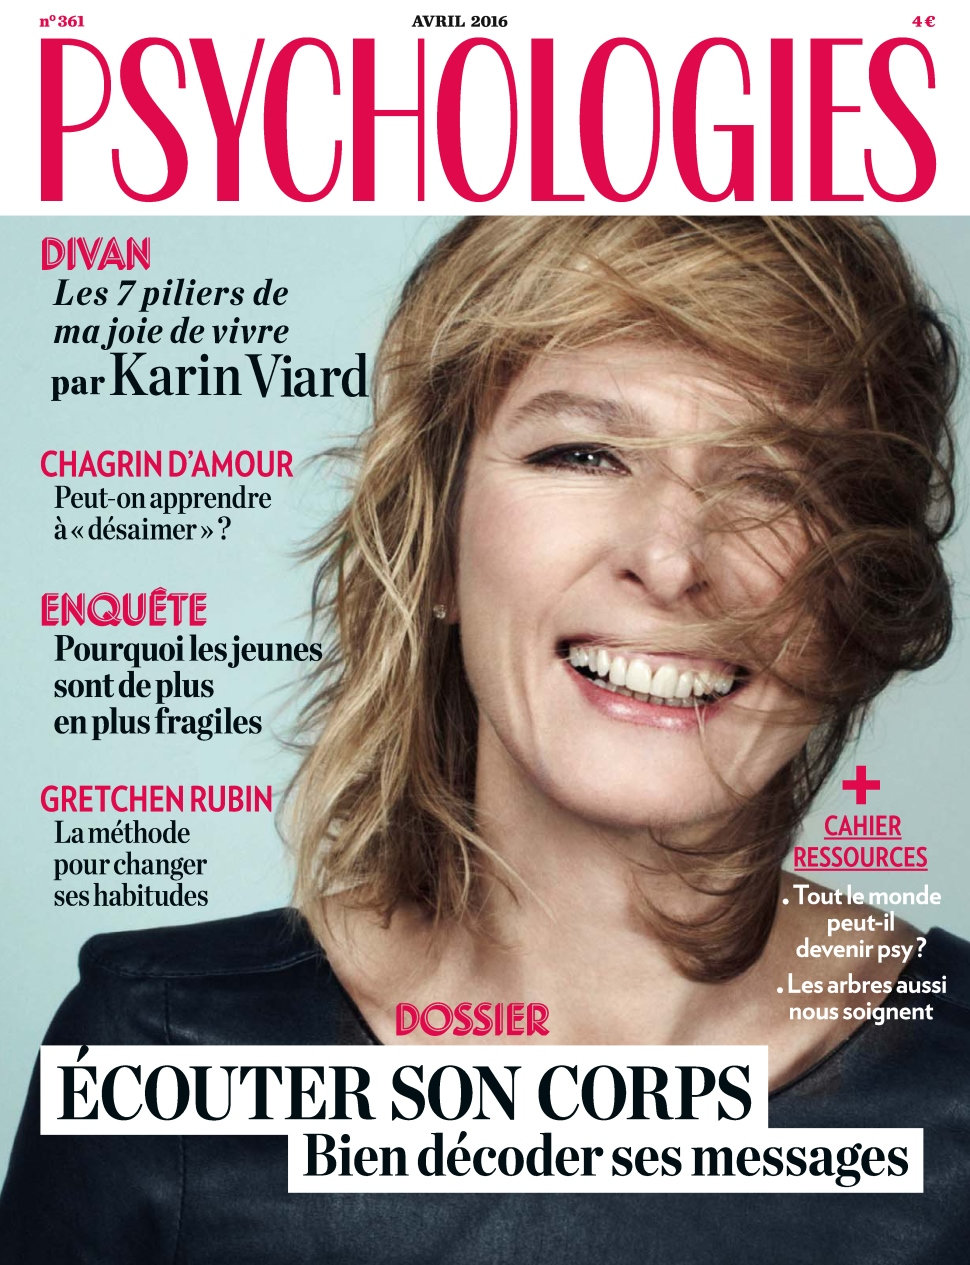 Psychologies Magazine N°361 - Avril 2016